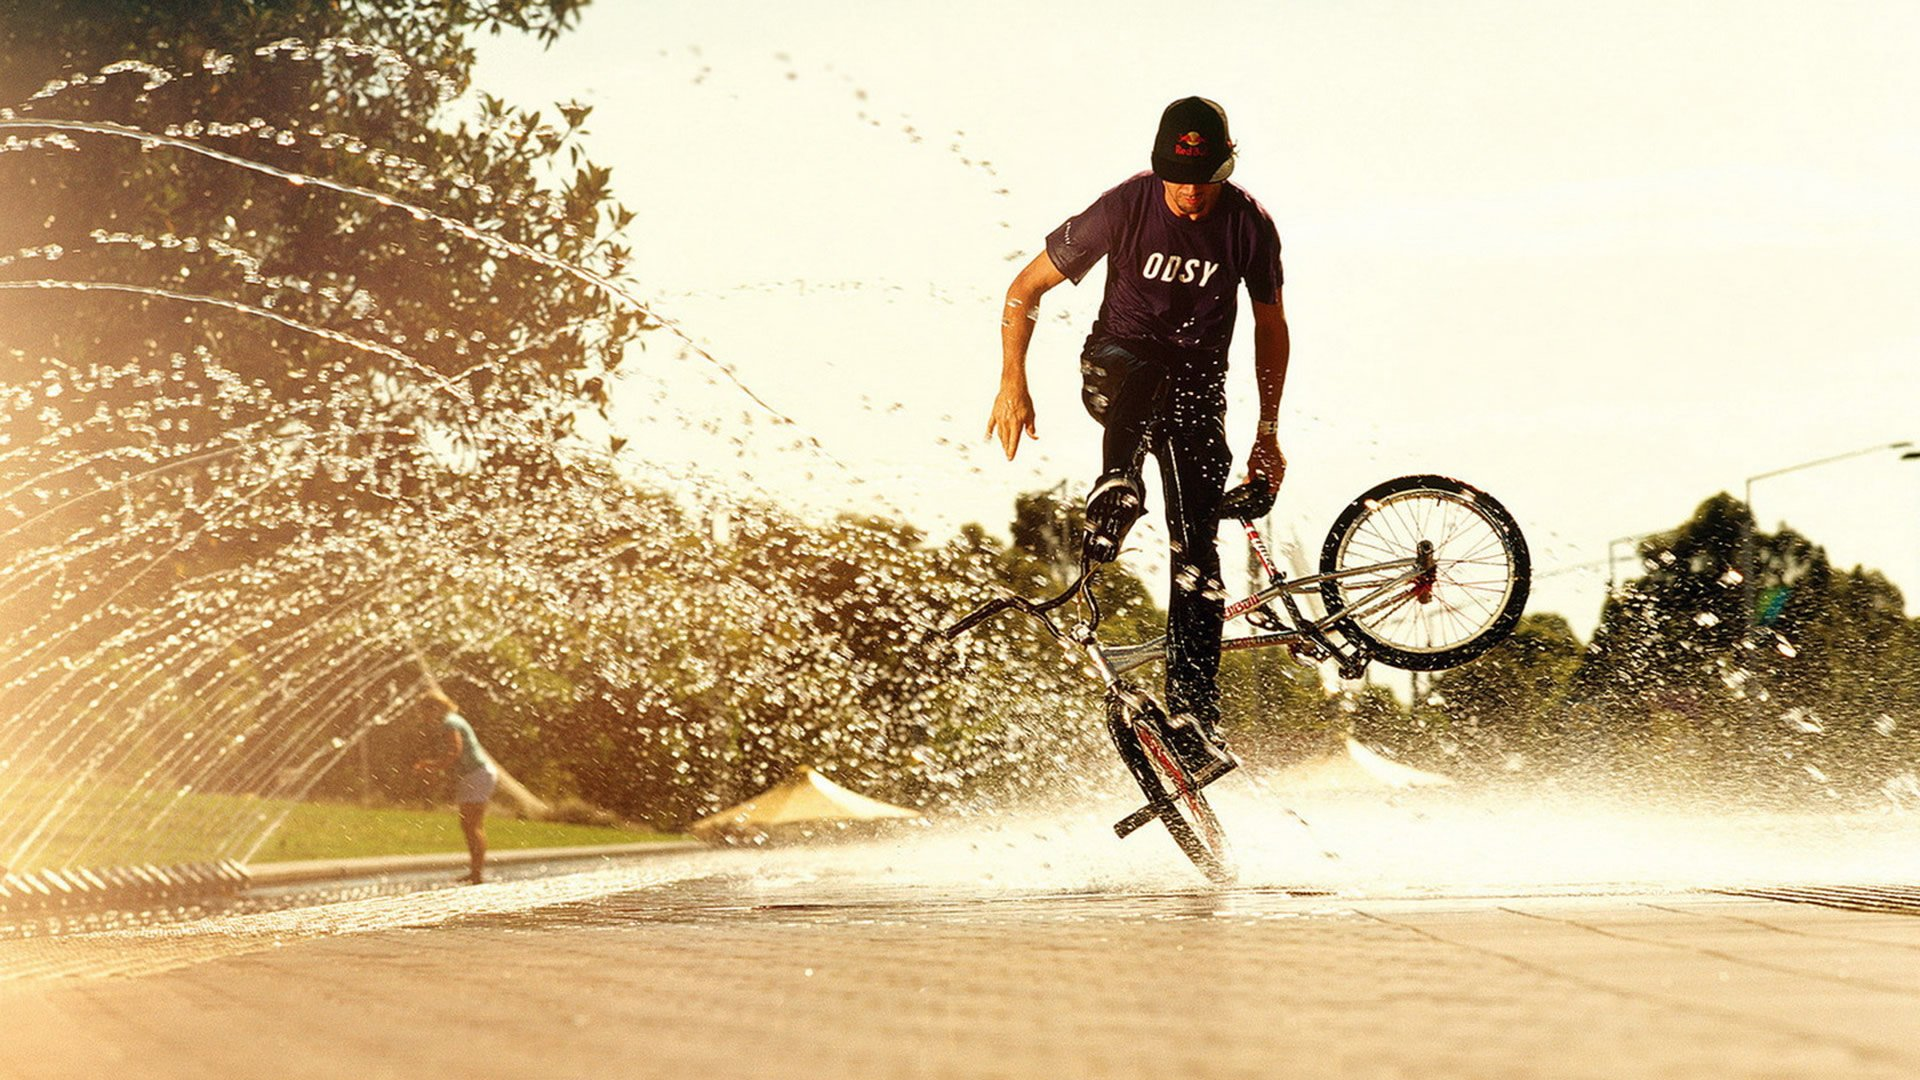 4 Tips Bersepeda yang Tetap Aman di Tengah Musim Penghujan | source: alphacoders.com